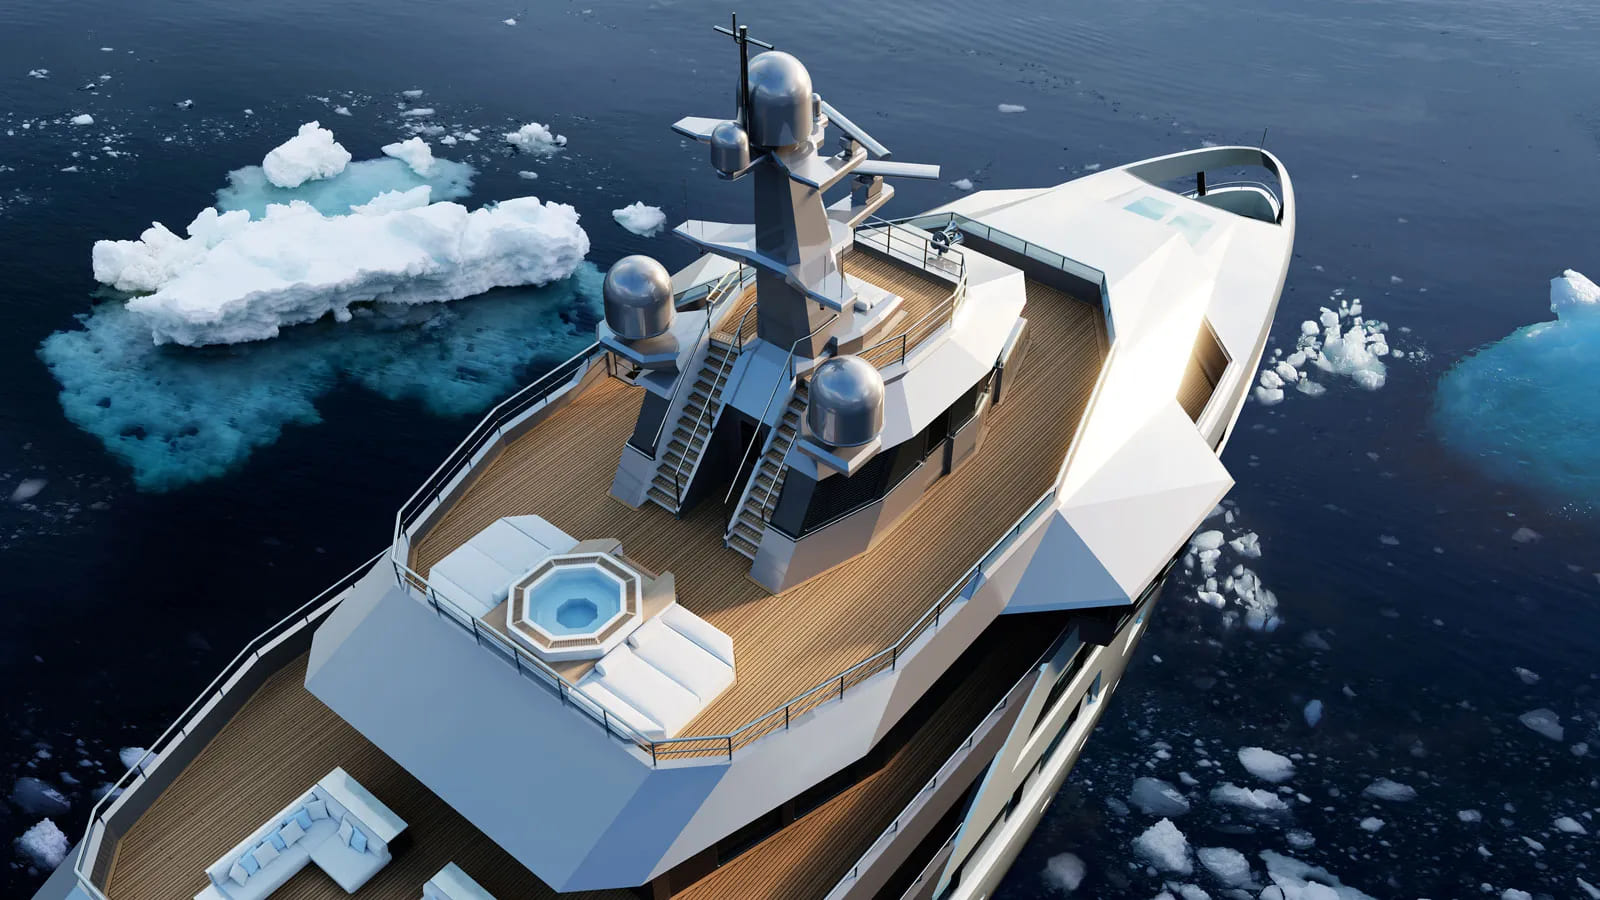 Damen Yachting SeaXplorer 77 novo design - boat shopping